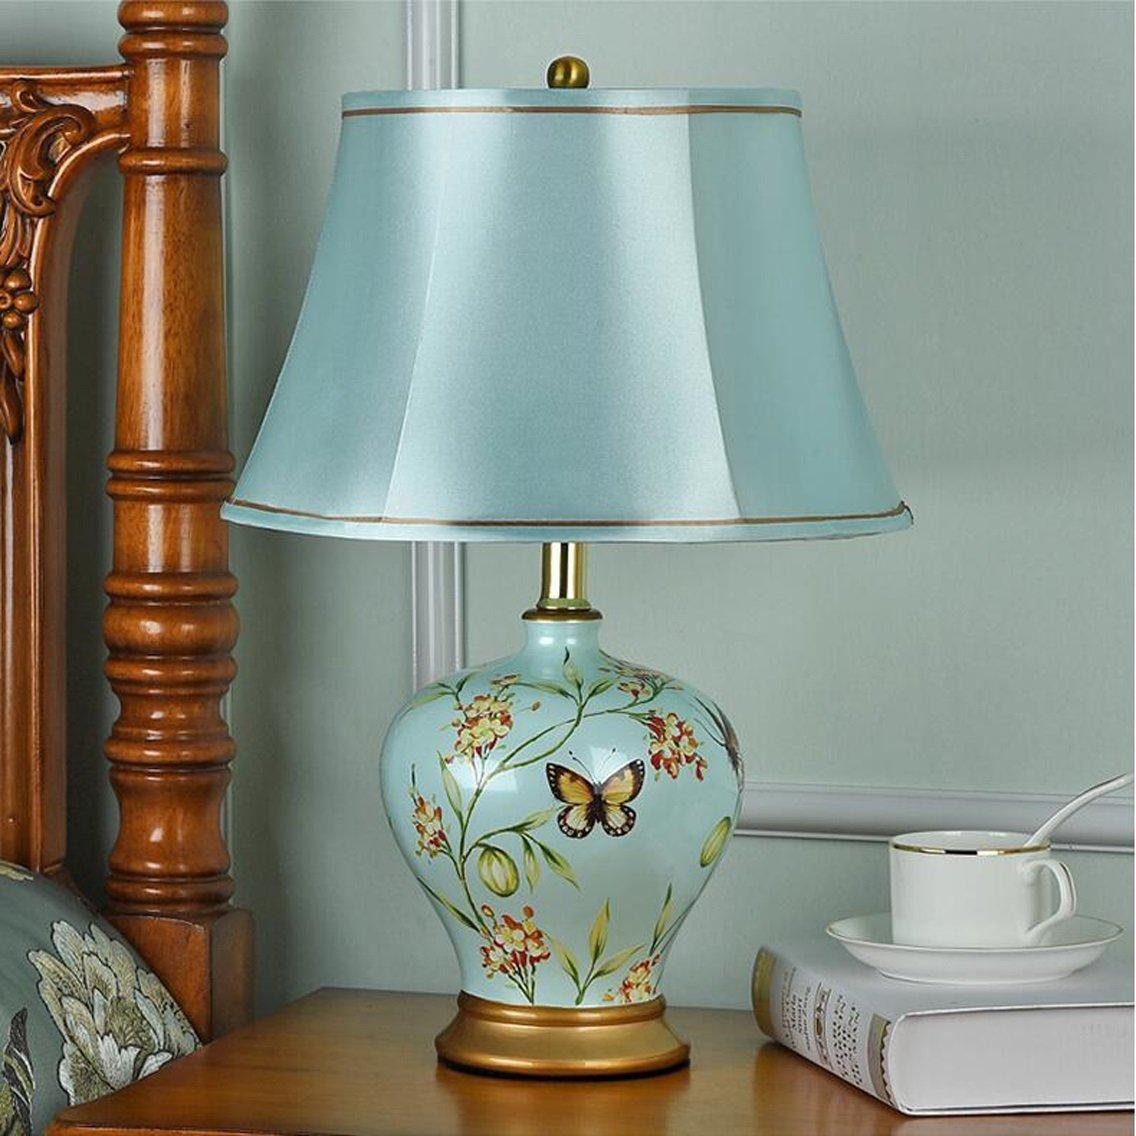 Amazon.com: HZB europeo lámpara de mesa recámara lámpara de ...